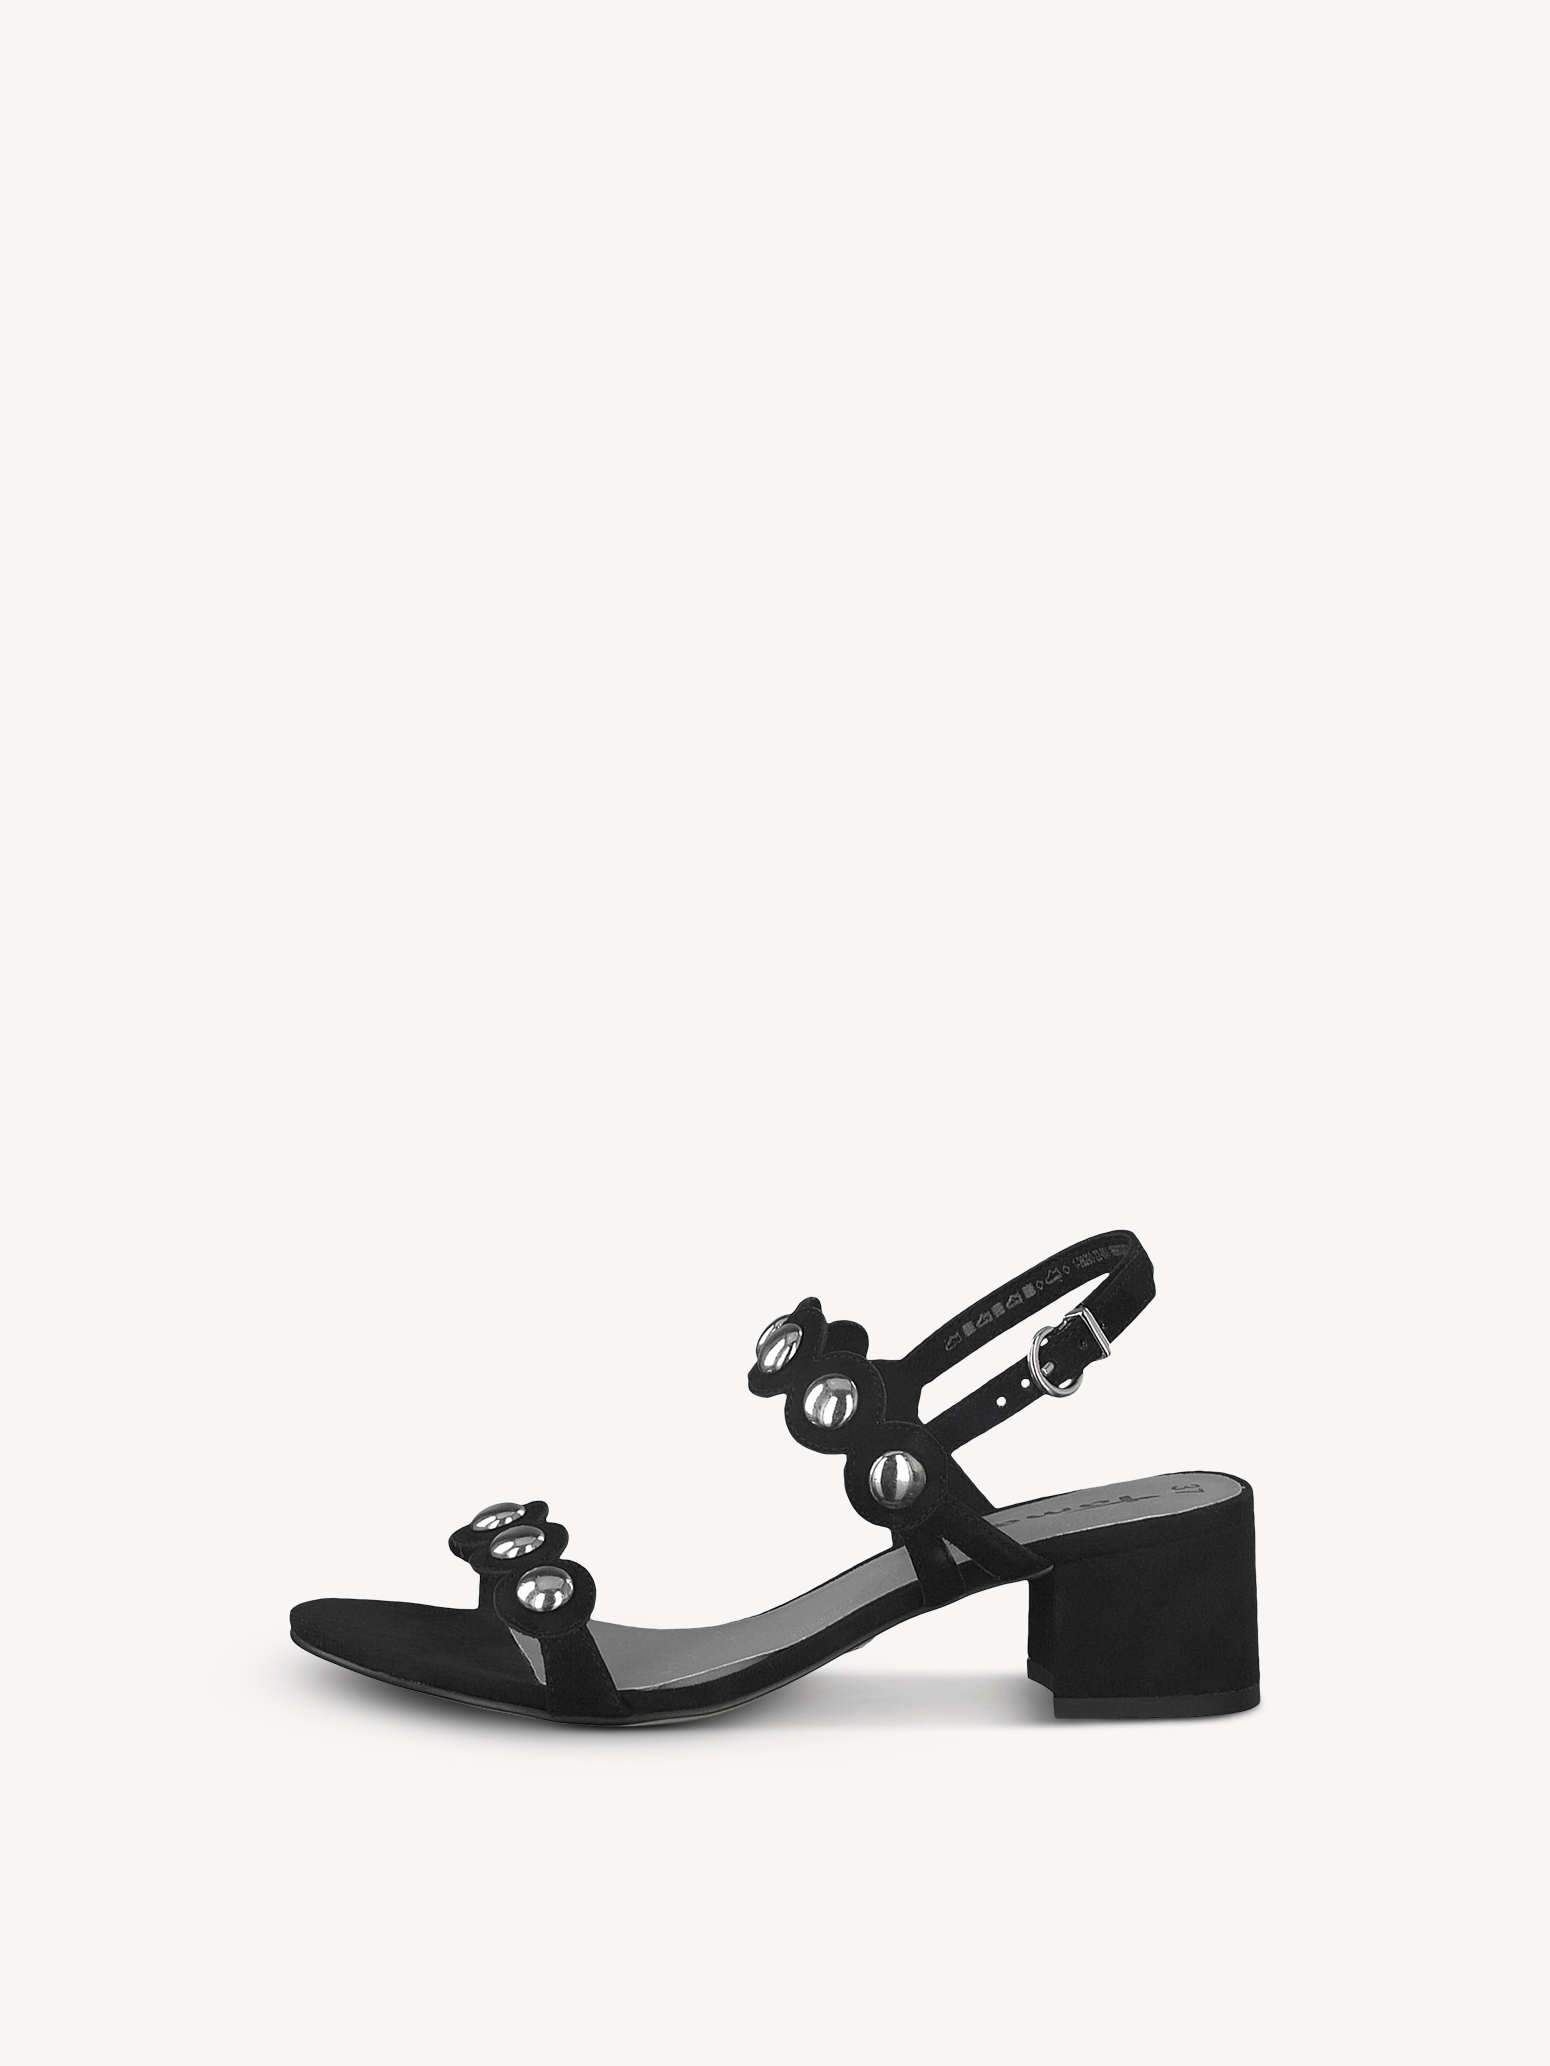 22Tamaris Online Kaufen 1 Ledersandalette 28203 1 Sandaletten WI29EeDHY